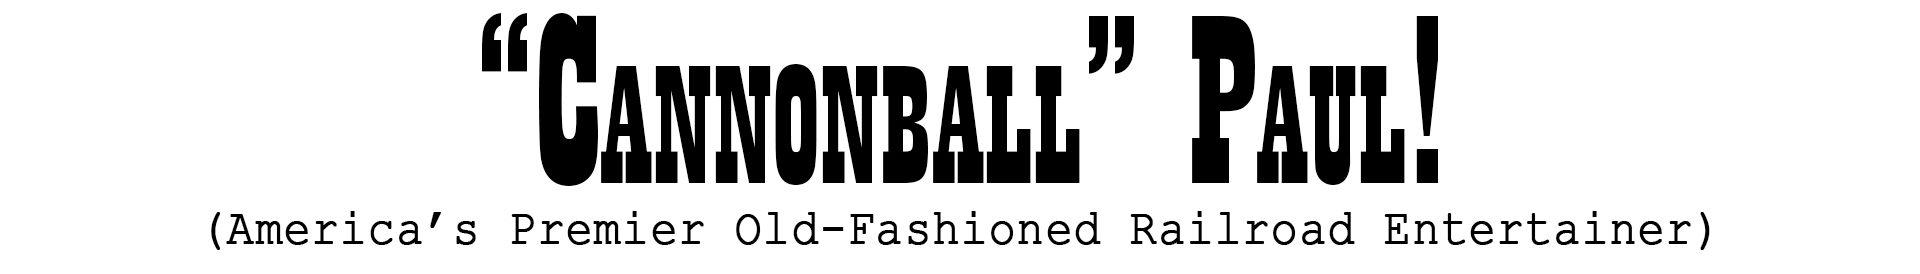 """Cannonball"" Paul!"